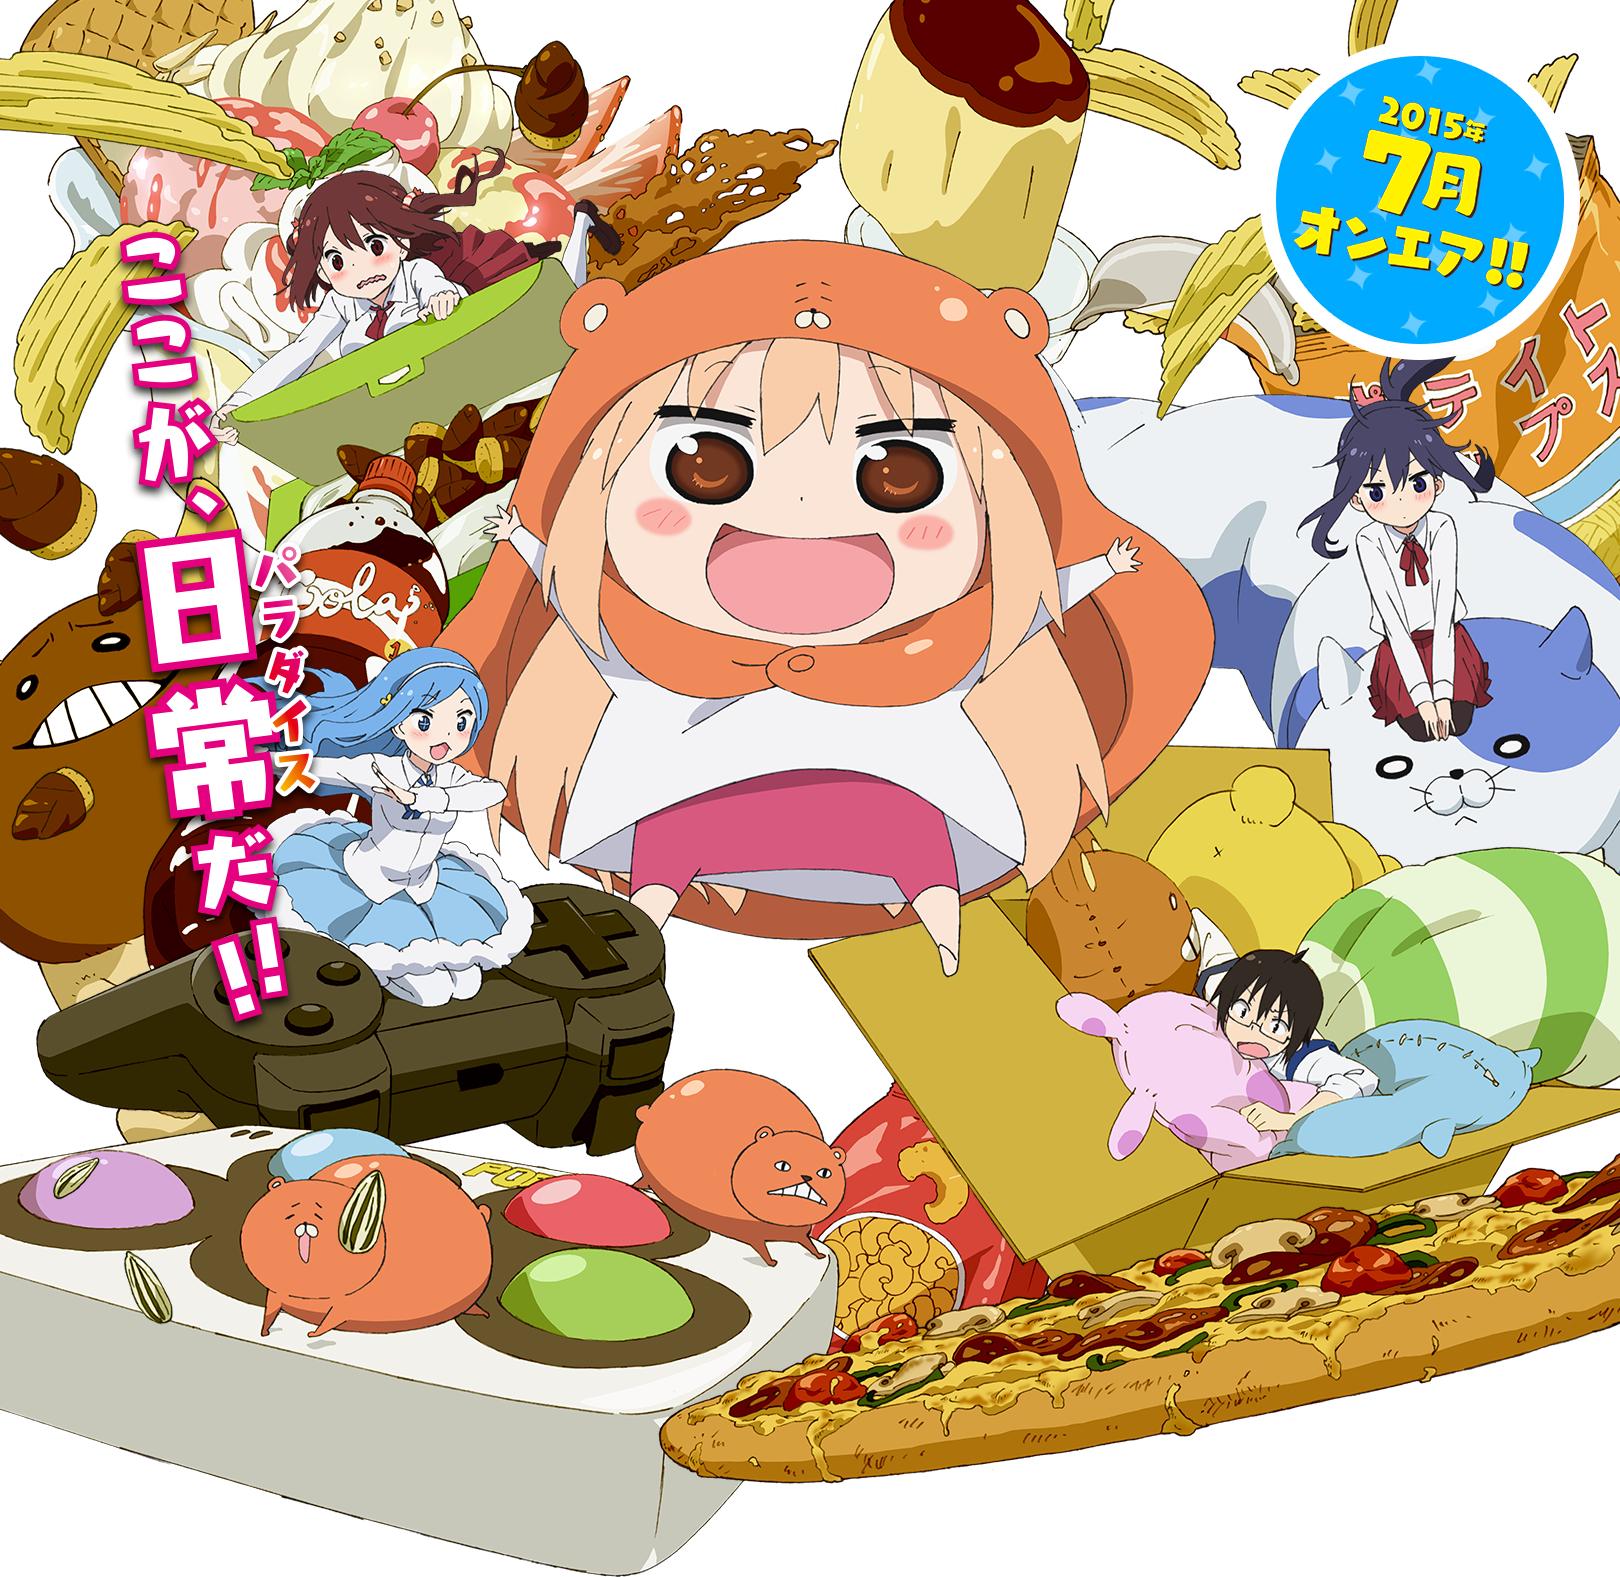 [Anime] Himouto ! Umaru-chan : La soeur parfaite ? Himouto%21.Umaru-chan.full.1874506